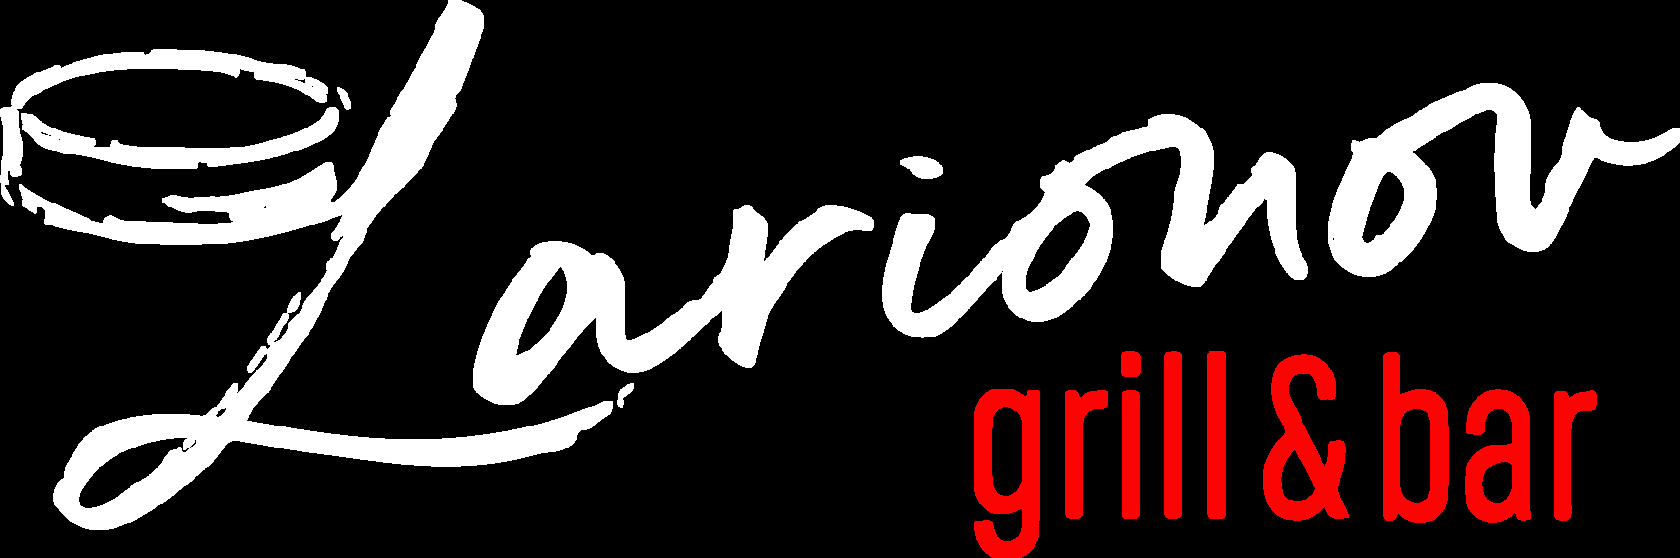 Larionov Grill & Bar, г. Московский